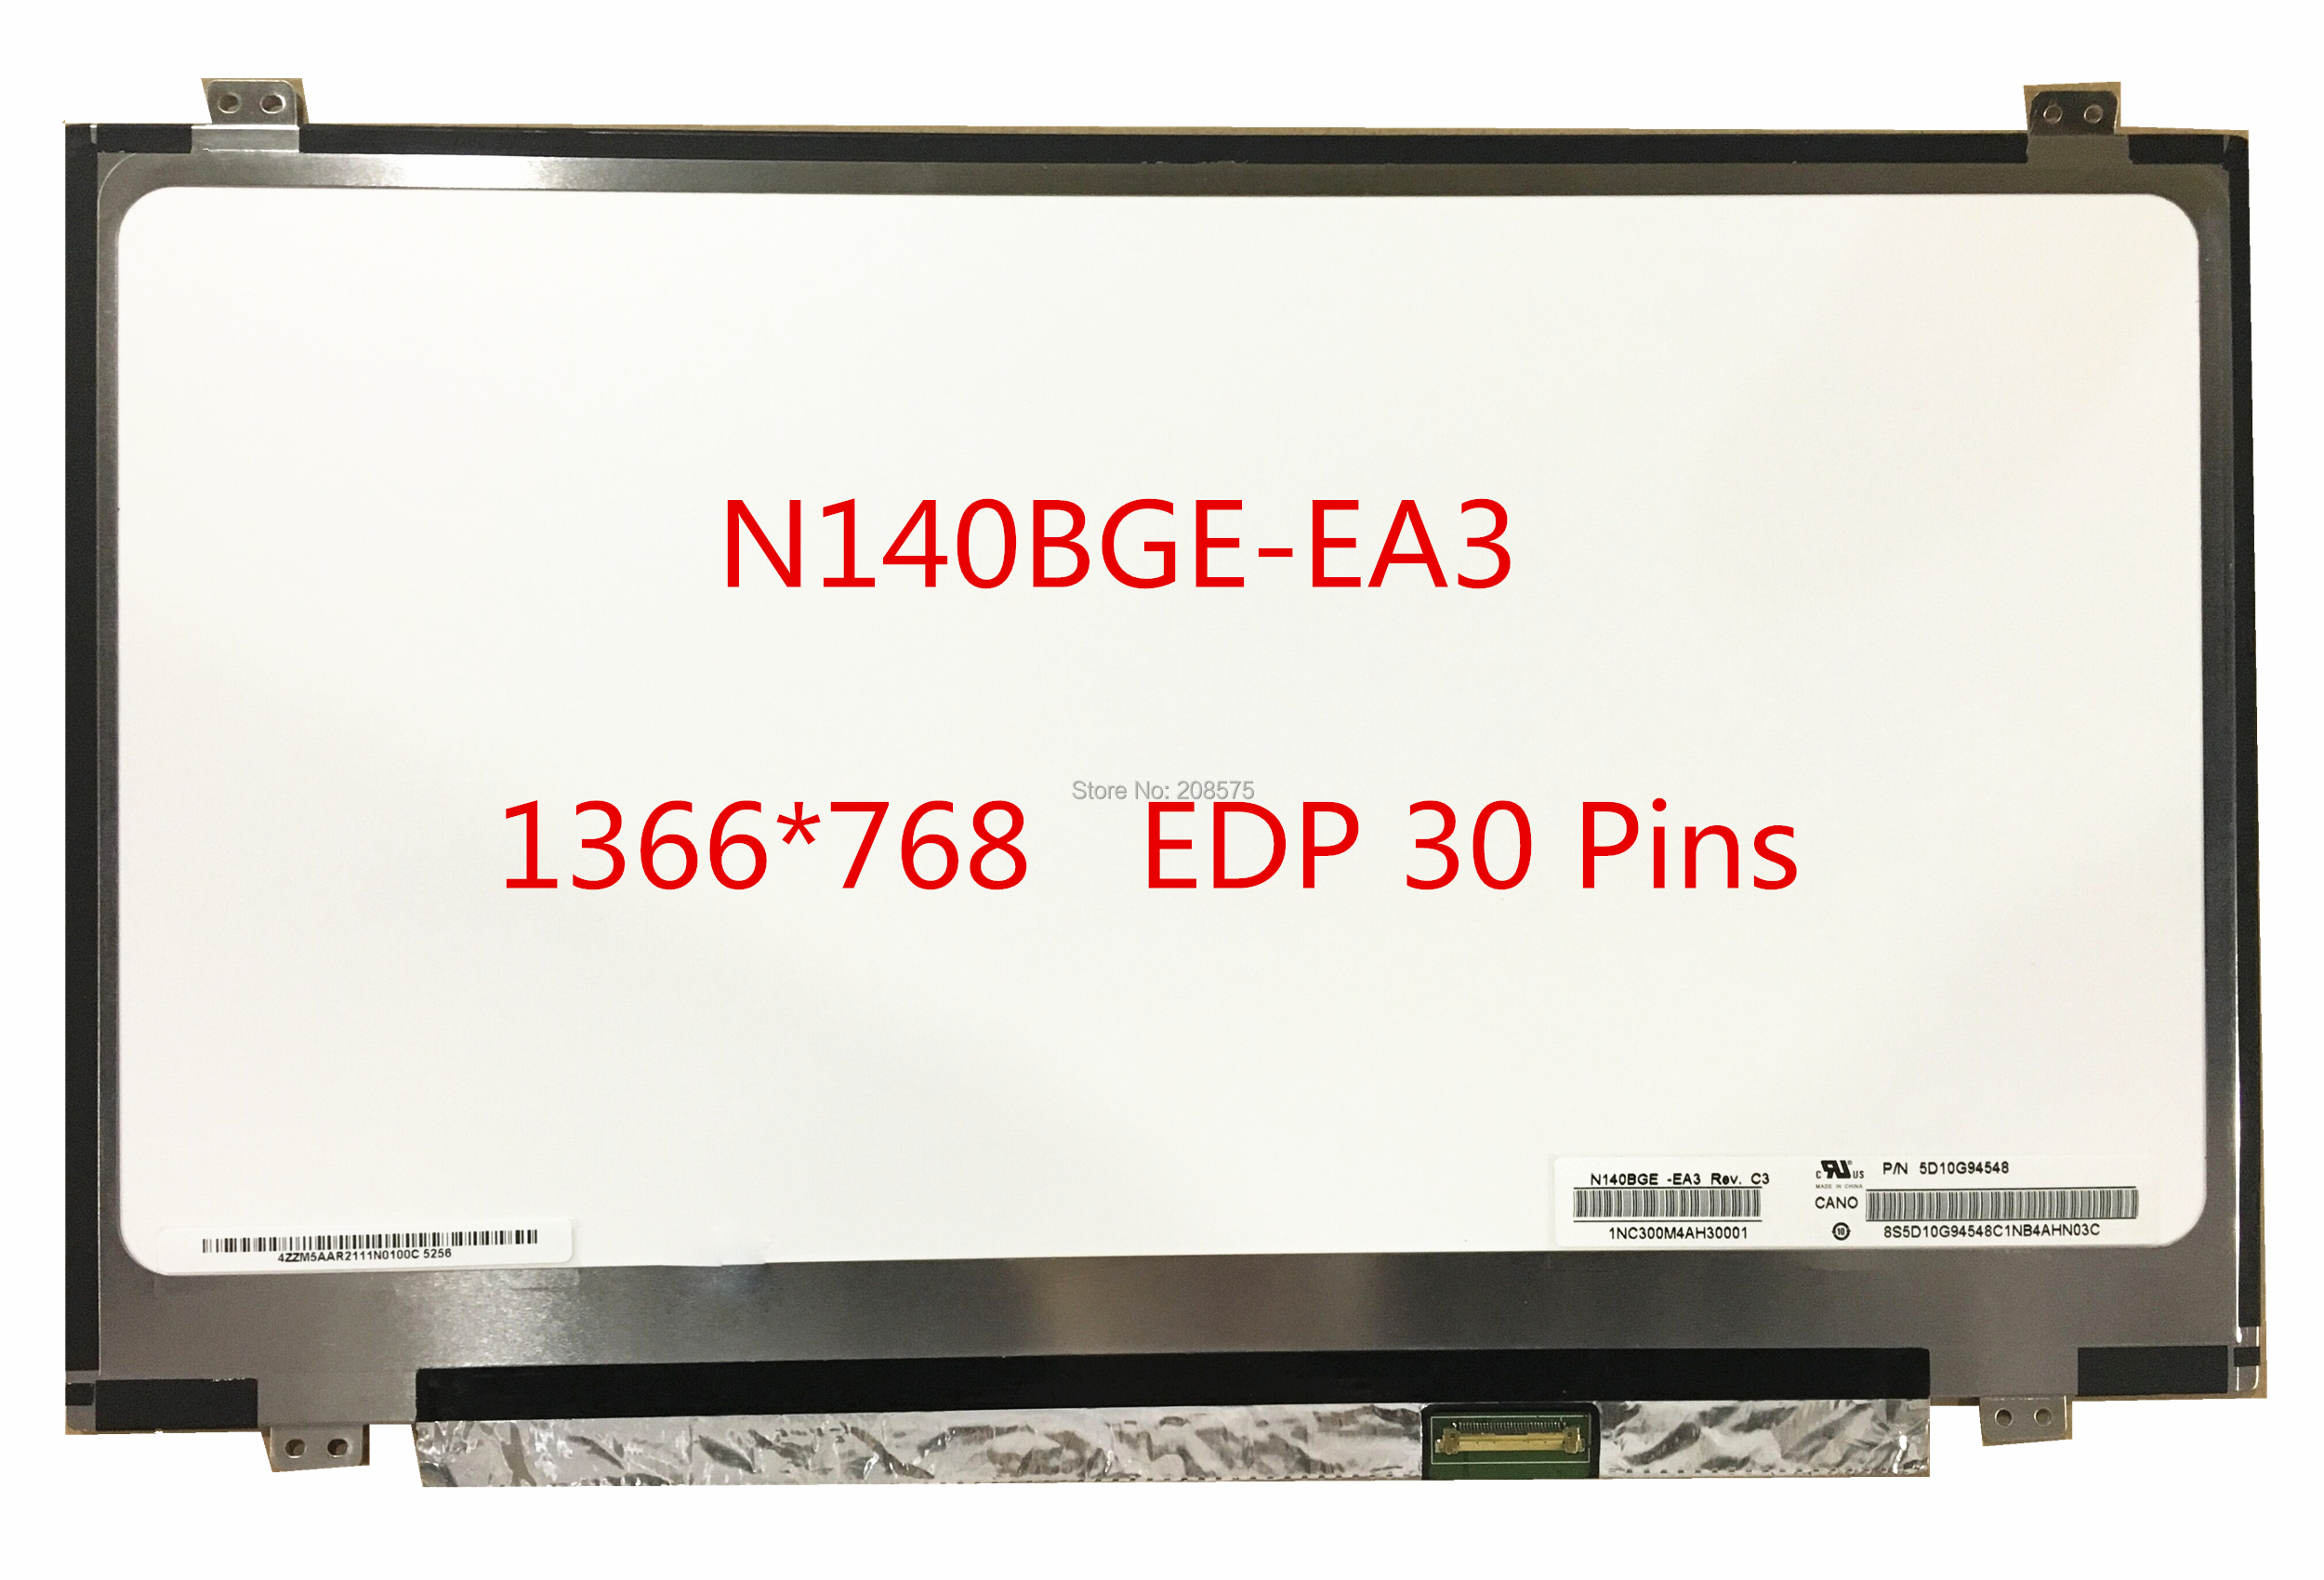 Free Shipping N140BGE-EA3 N140BGE EA3 B140XTN02.E B140XTN02.4 LP140WH8 TPC1 N140BGE- E33 B140XTN02.A B140XTN02.D 30 PinsFree Shipping N140BGE-EA3 N140BGE EA3 B140XTN02.E B140XTN02.4 LP140WH8 TPC1 N140BGE- E33 B140XTN02.A B140XTN02.D 30 Pins